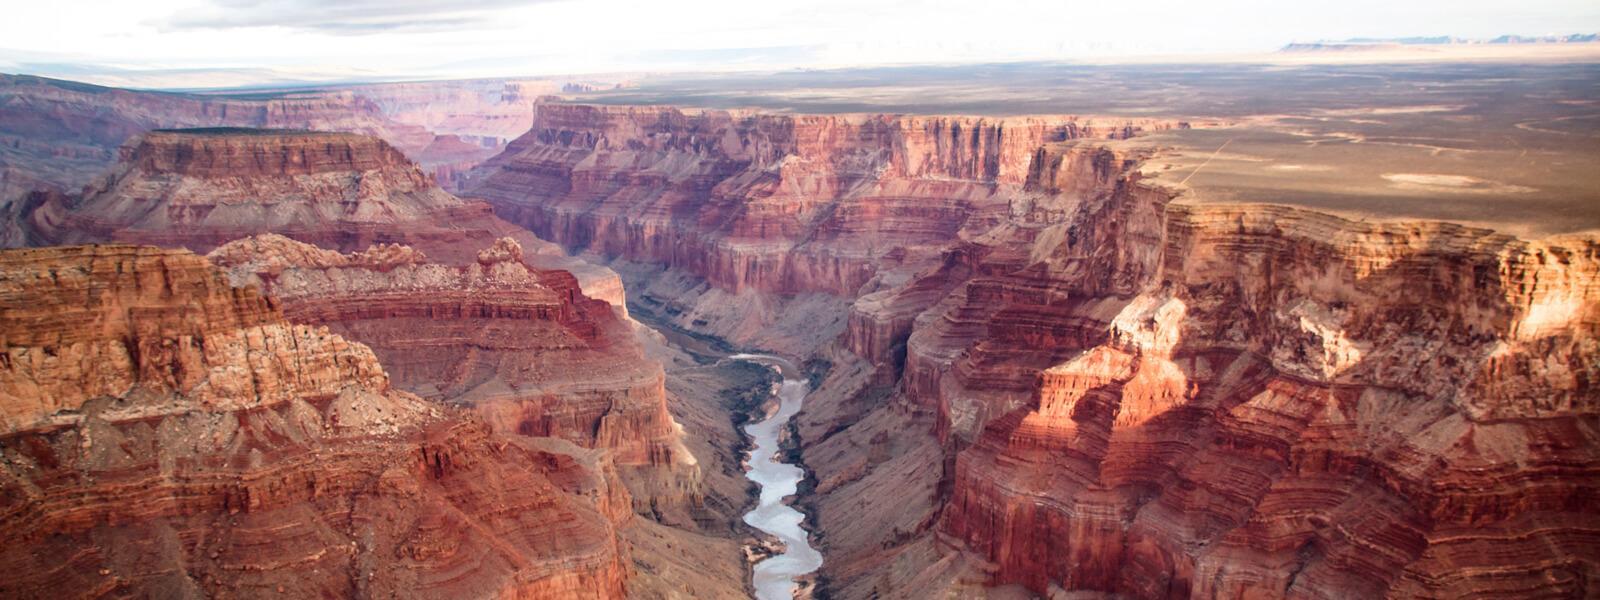 grand-canyon-1600x600.jpg